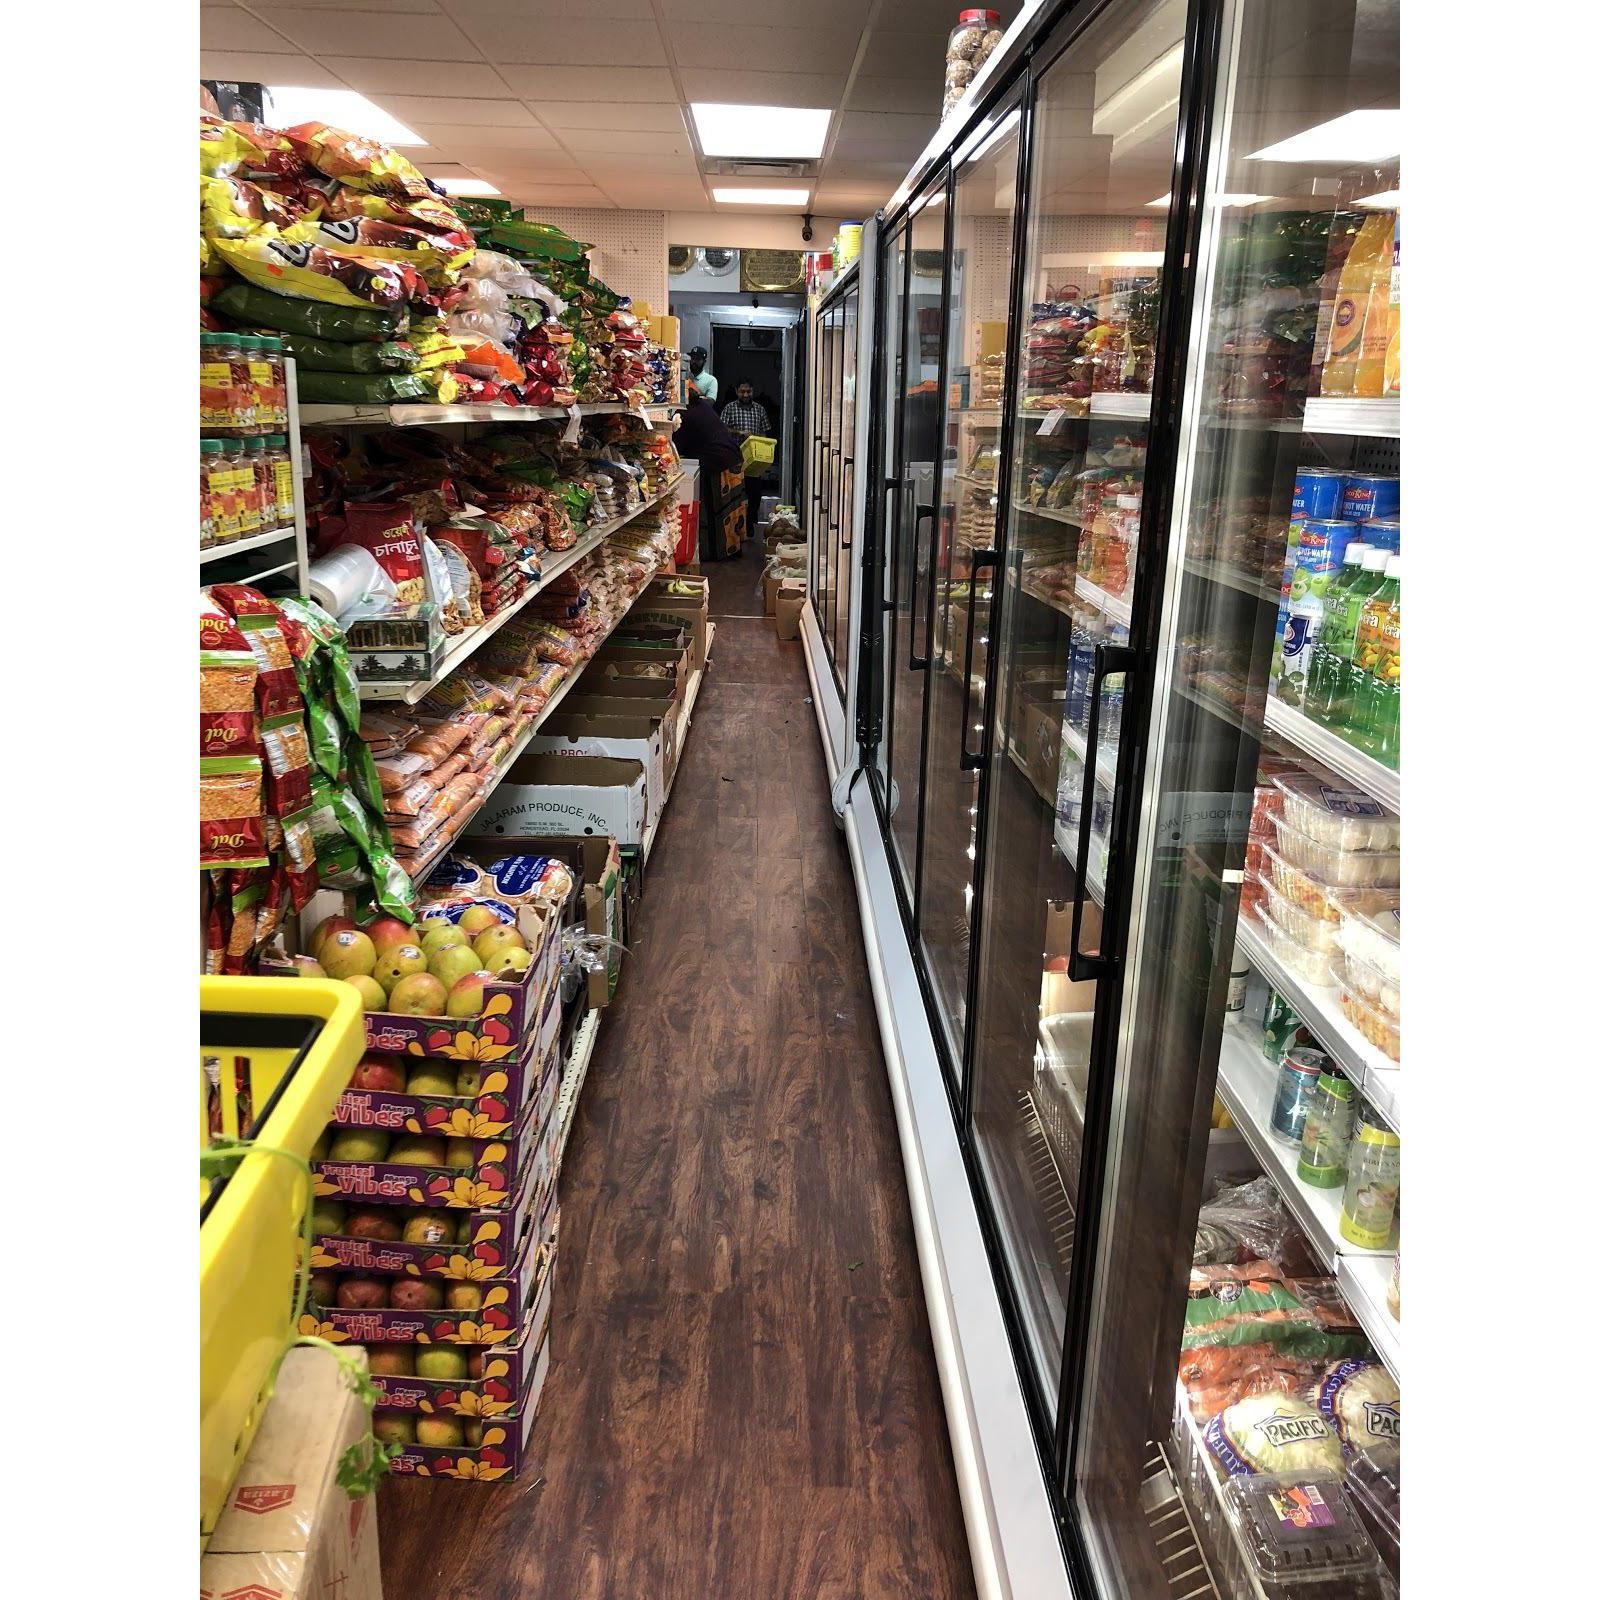 Zubaidah Halal Meat and Grocery